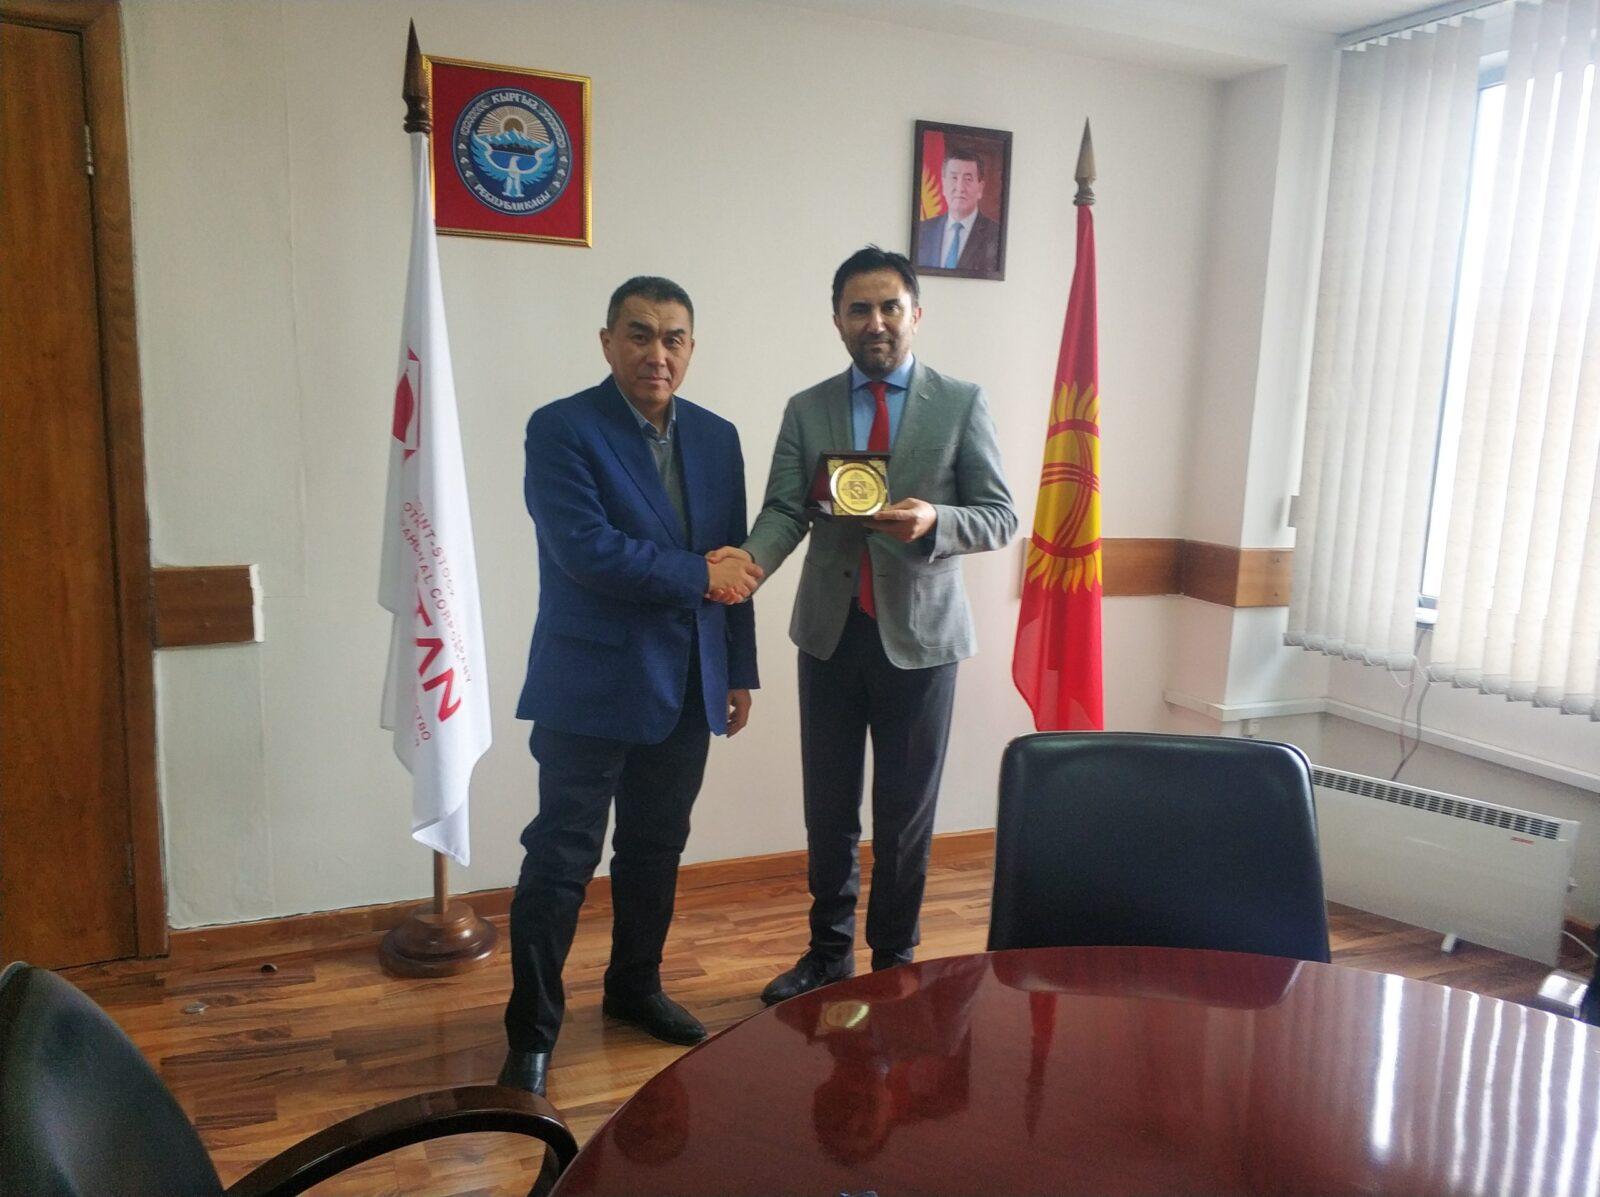 IMG 20200203 114101 1 scaled - Визит делегации из Турции